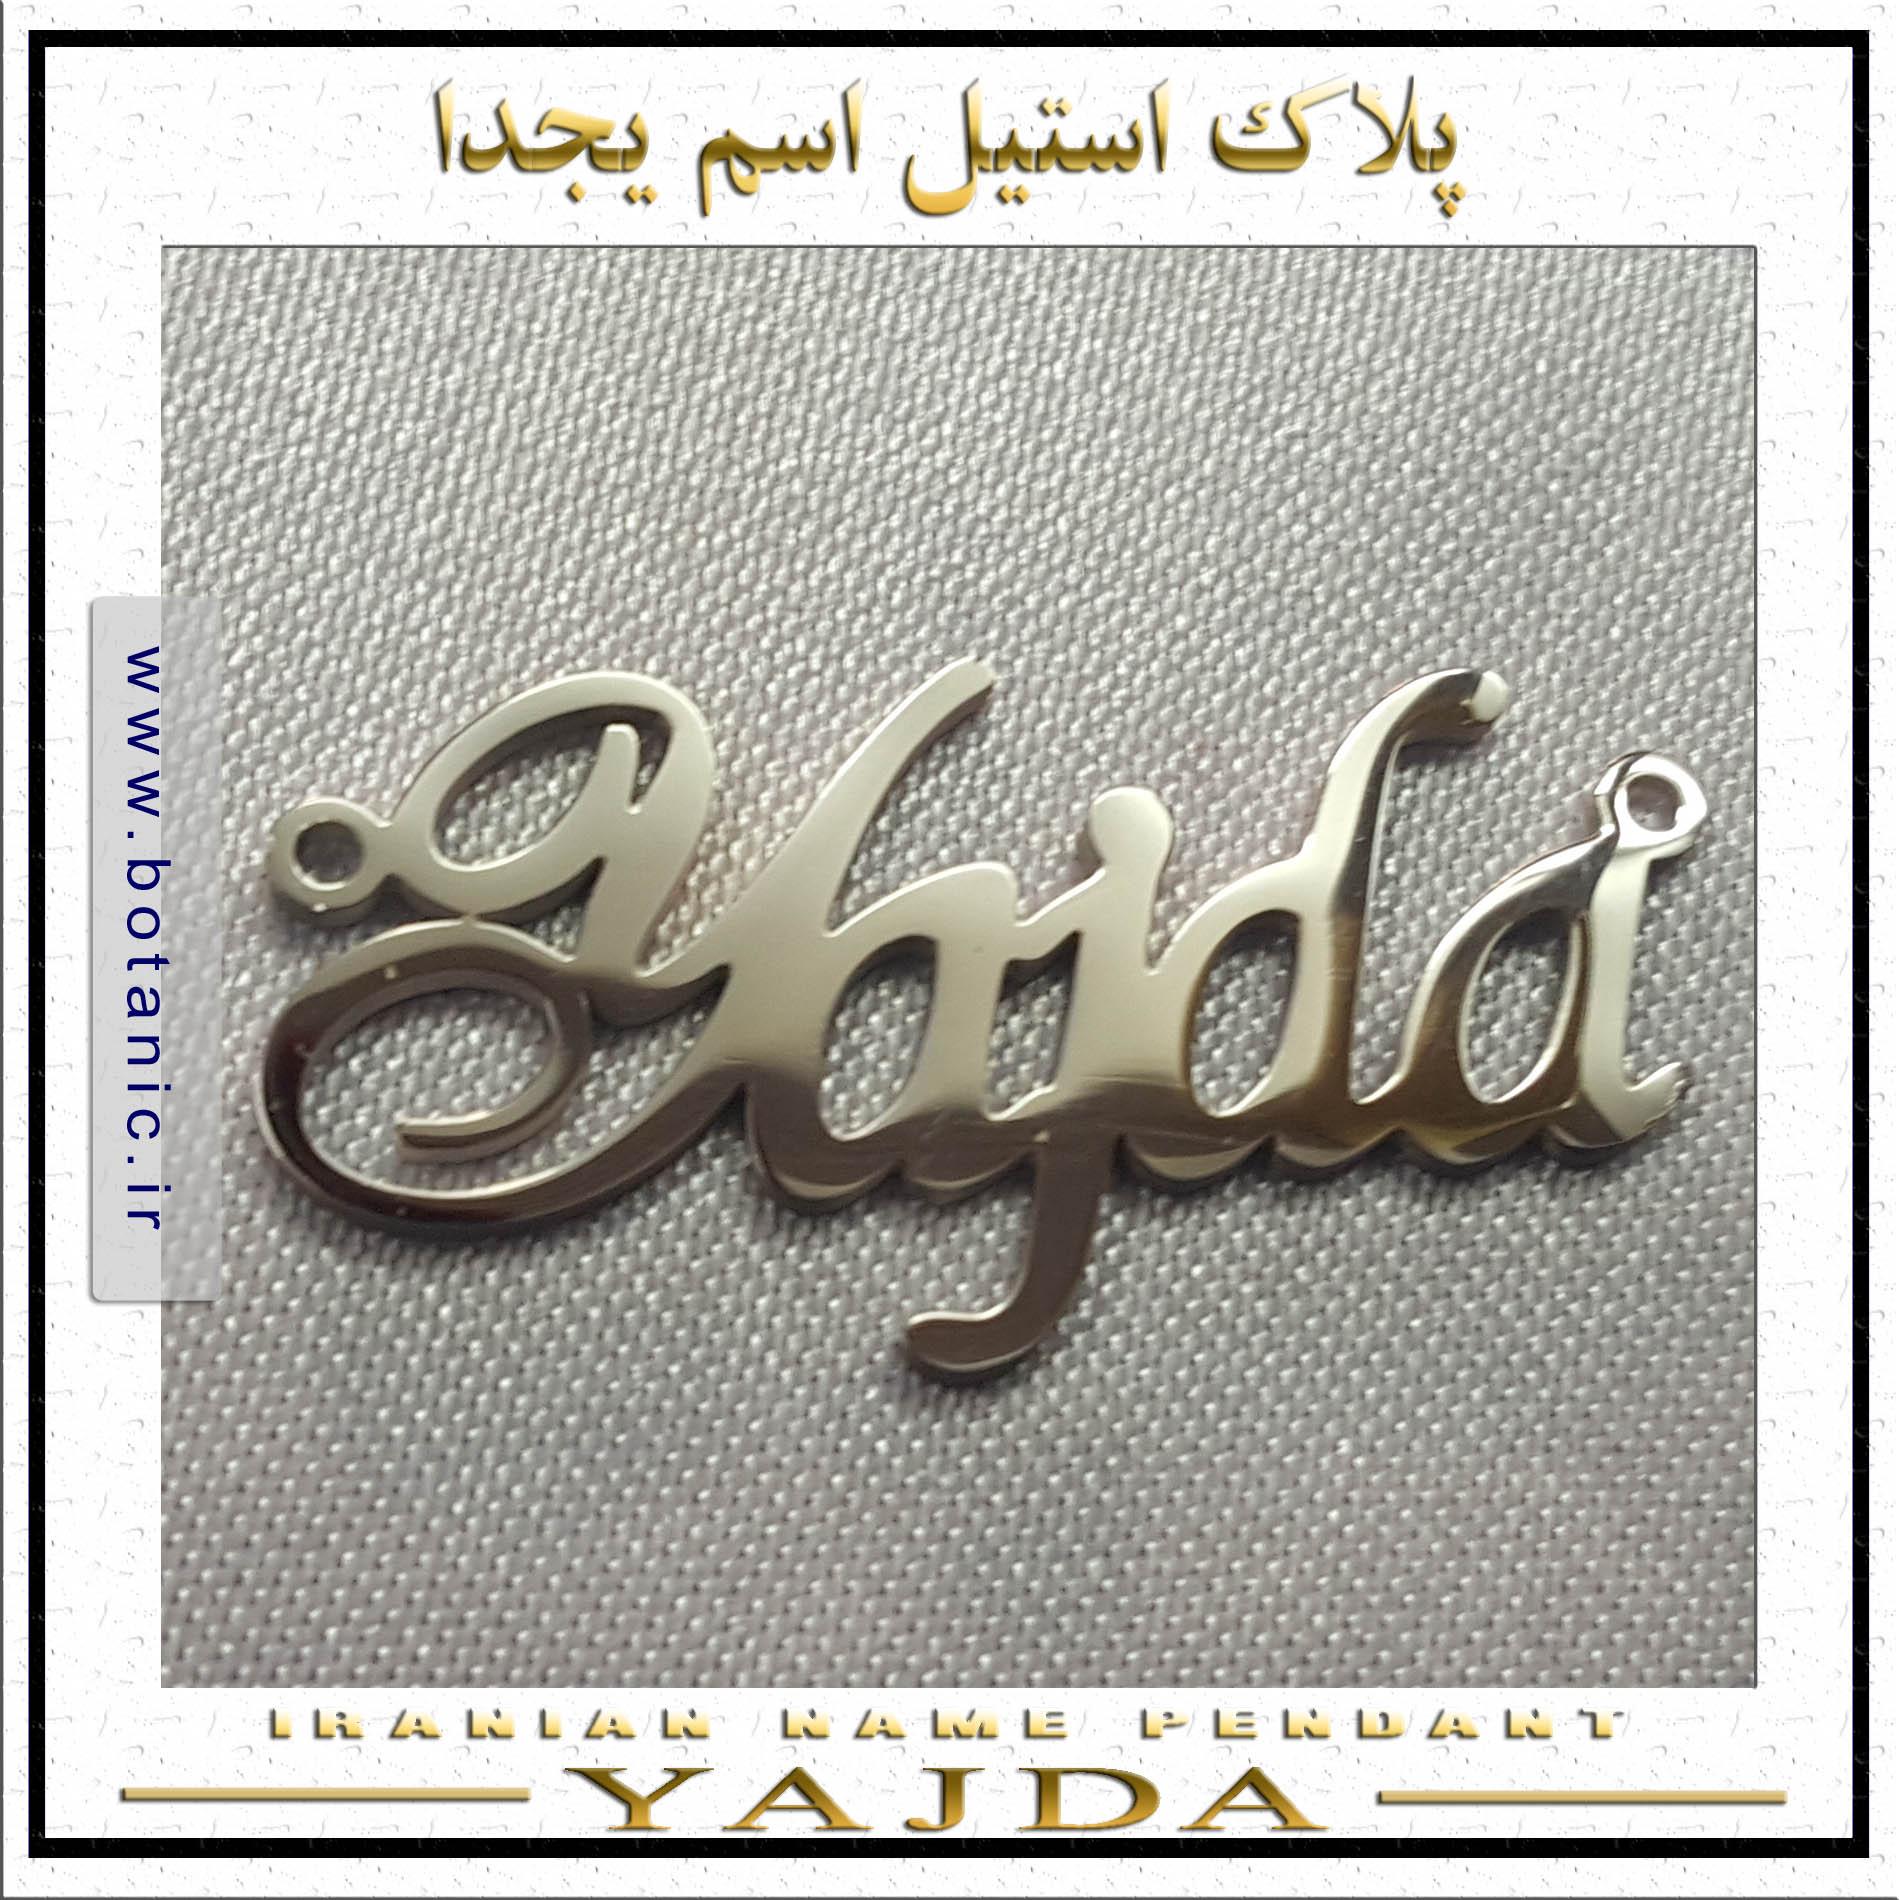 Iranian Name Pendant Yajda